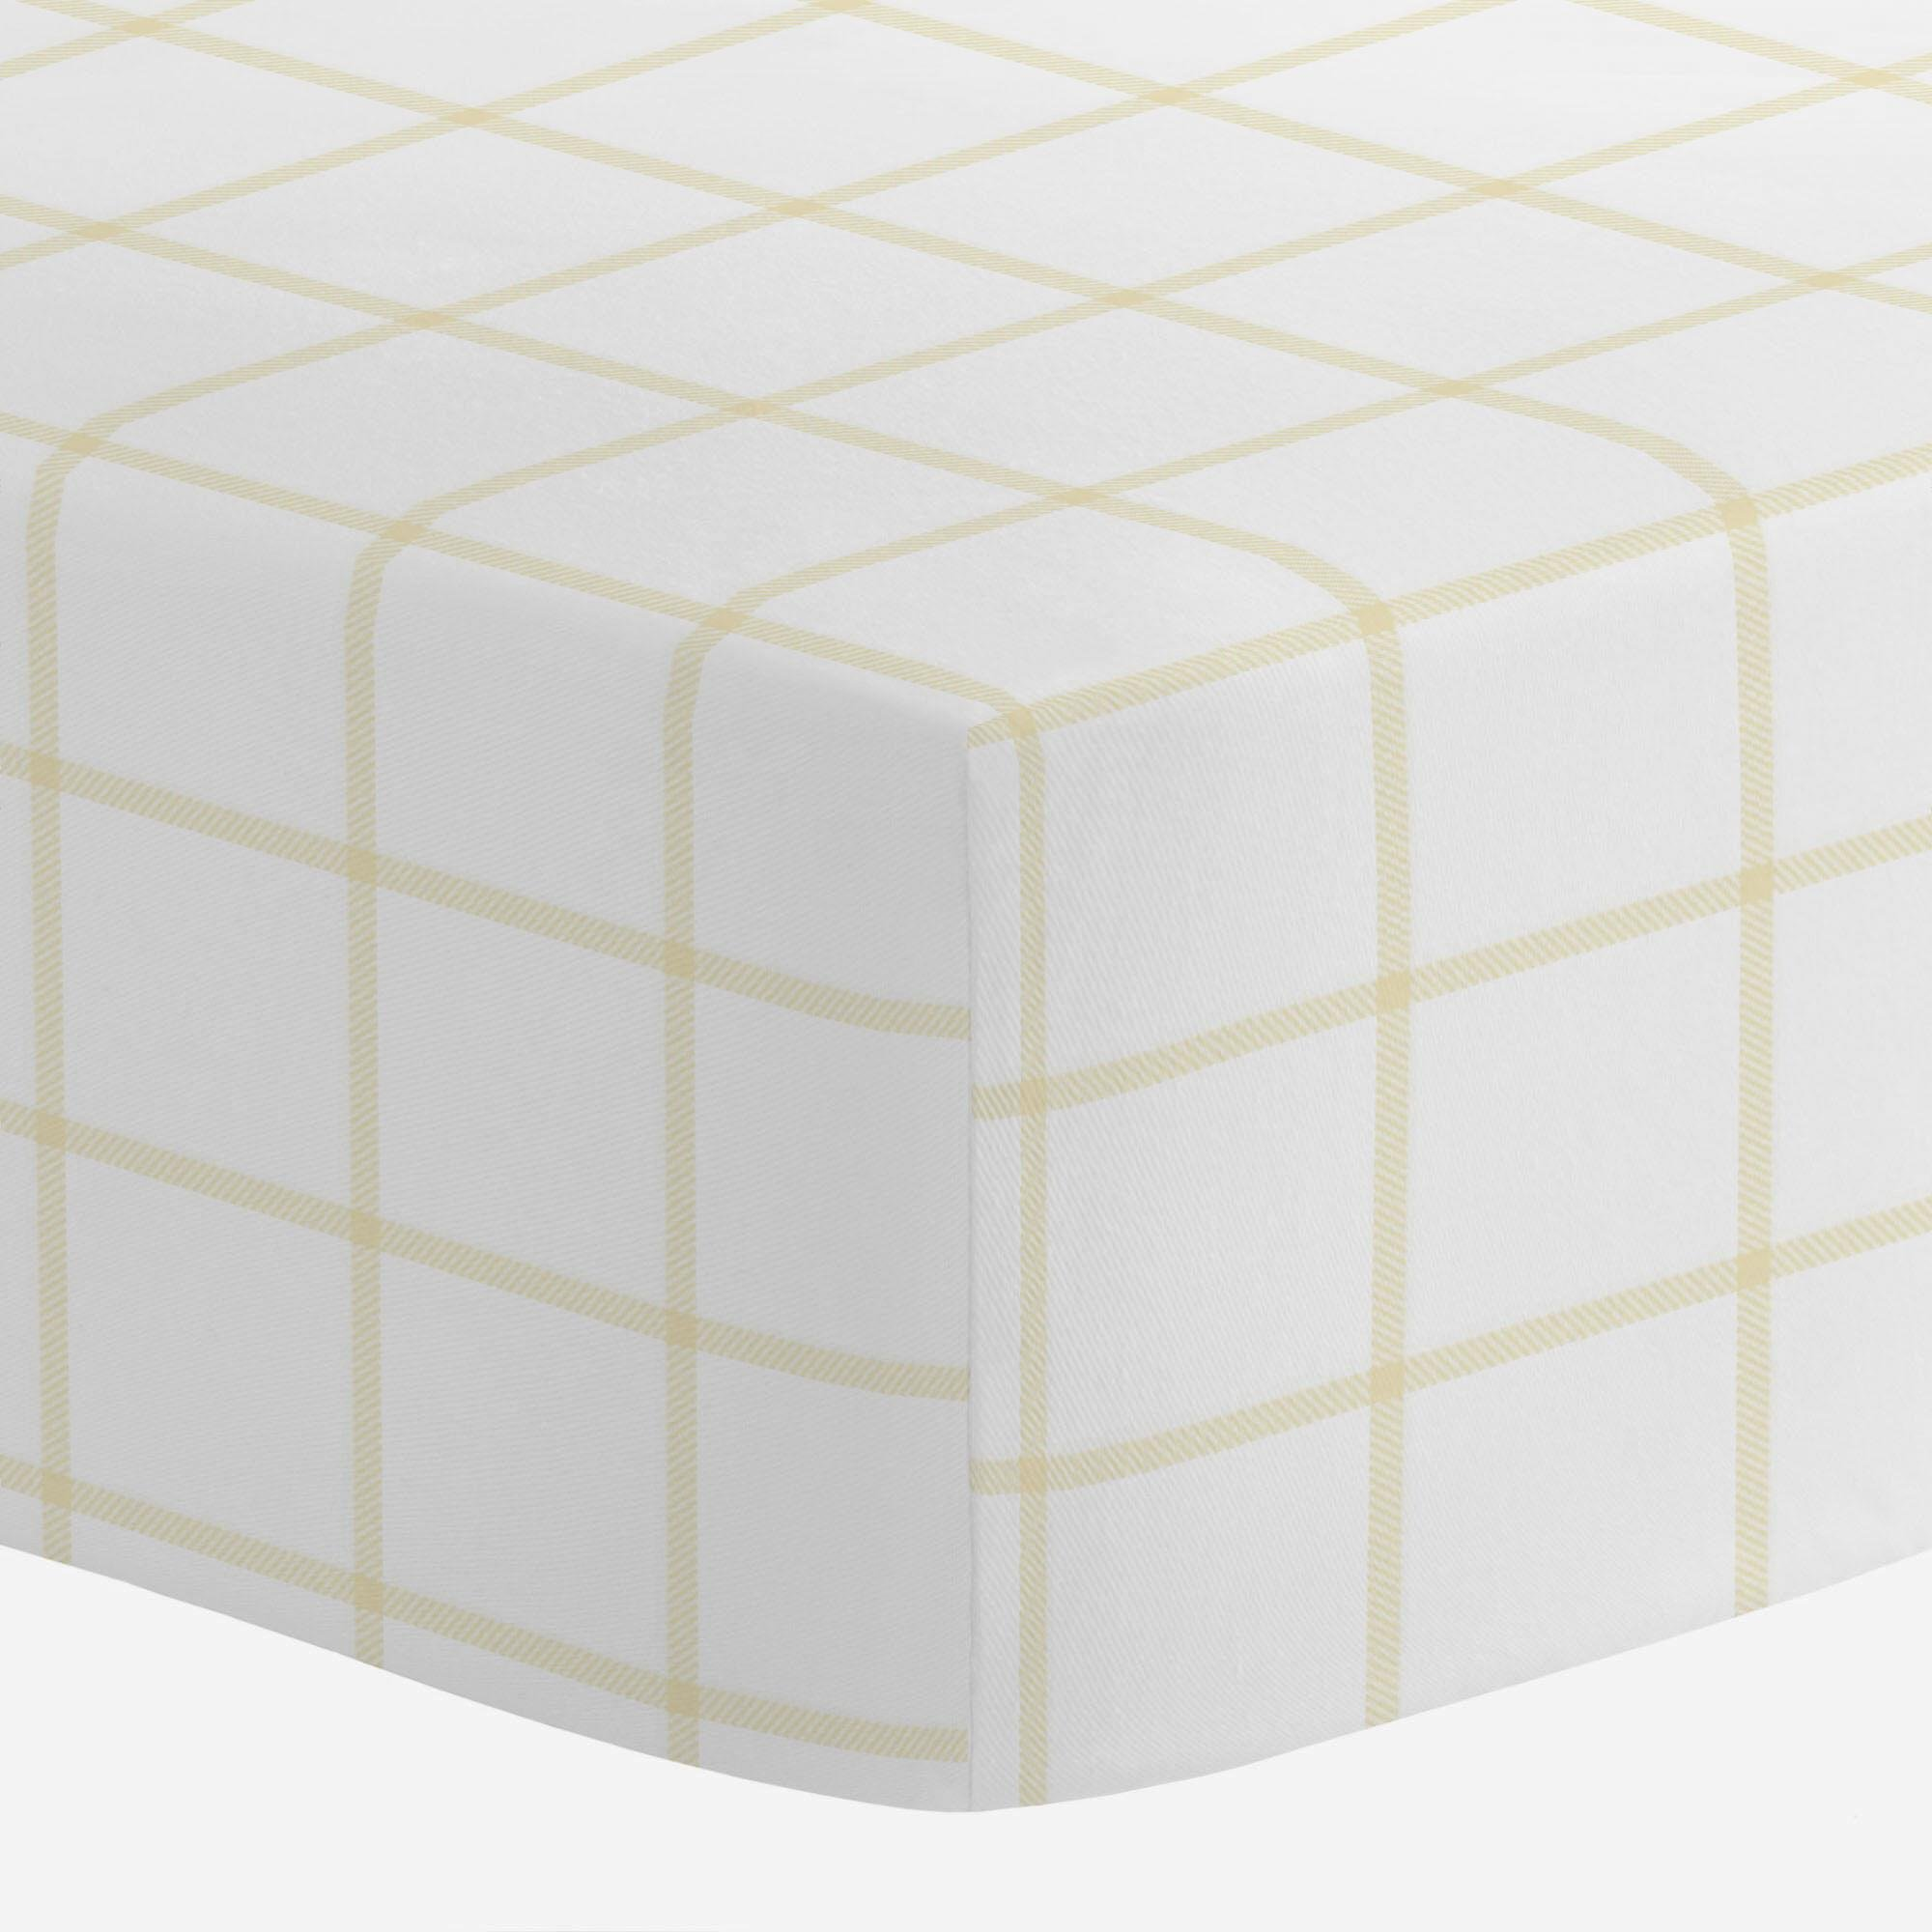 Carousel Designs Pale Yellow Windowpane Crib Sheet - Organic 100% Cotton Fitted Crib Sheet - Made in The USA